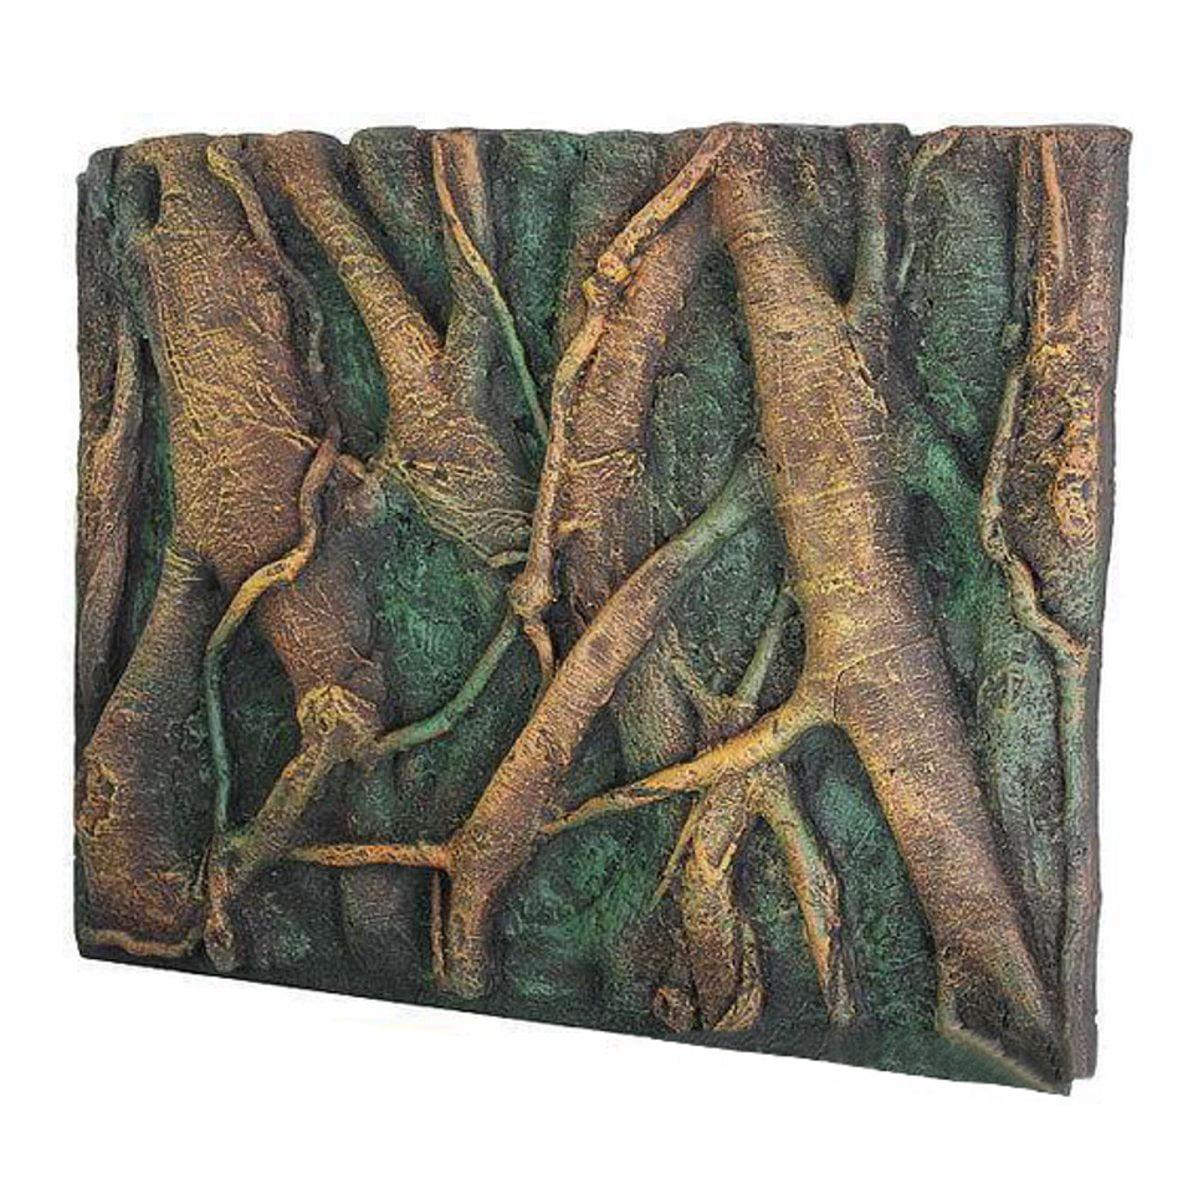 3D PU Aquarium Background,3D PU Tree Root Reptile Aquarium Fish Tank Background Board Plate Decor 60x45cm by